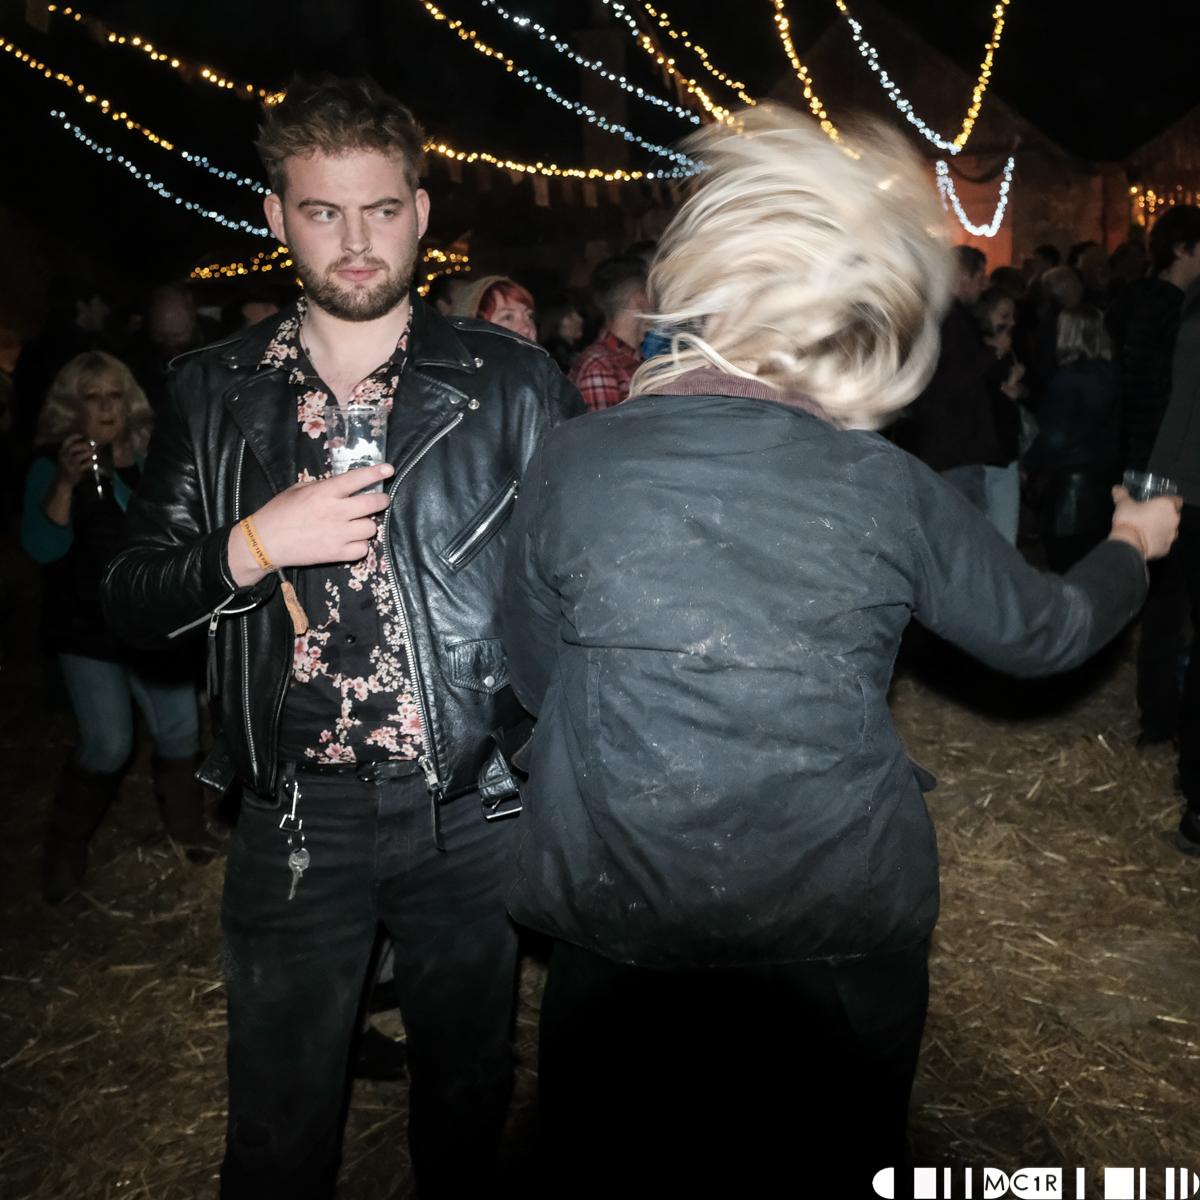 Folk 25 at Jocktoberfest 2018  - Jocktoberfest 2018 , Friday (Folk) - Images